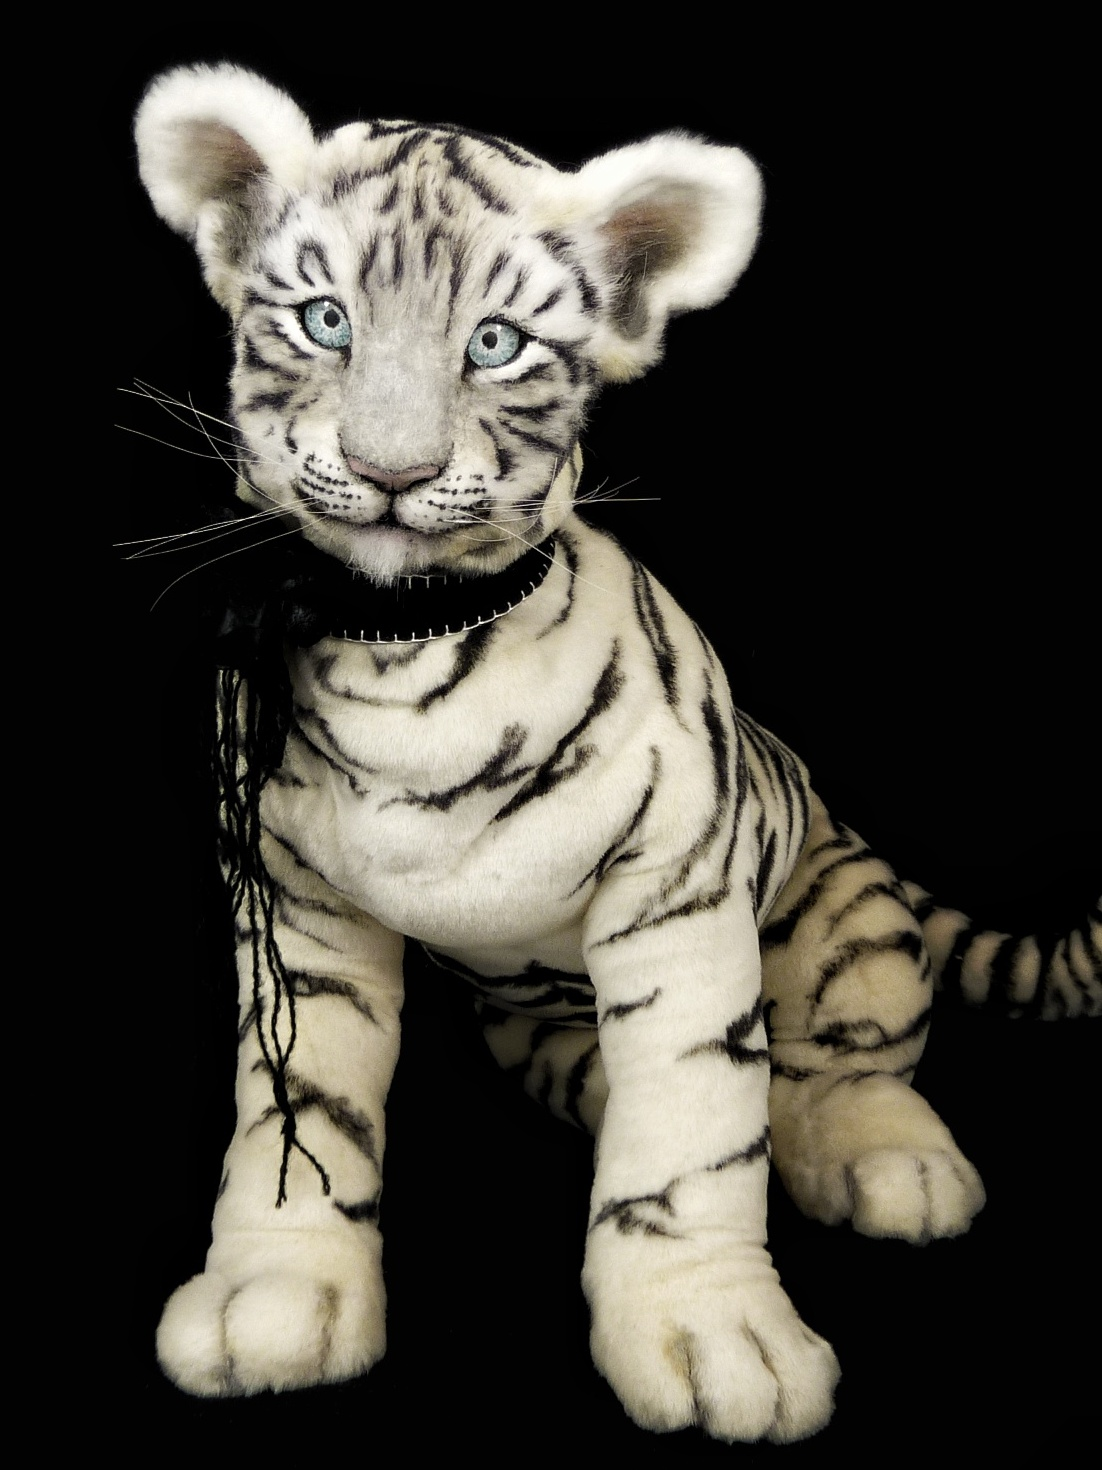 ASIA the tiger cub